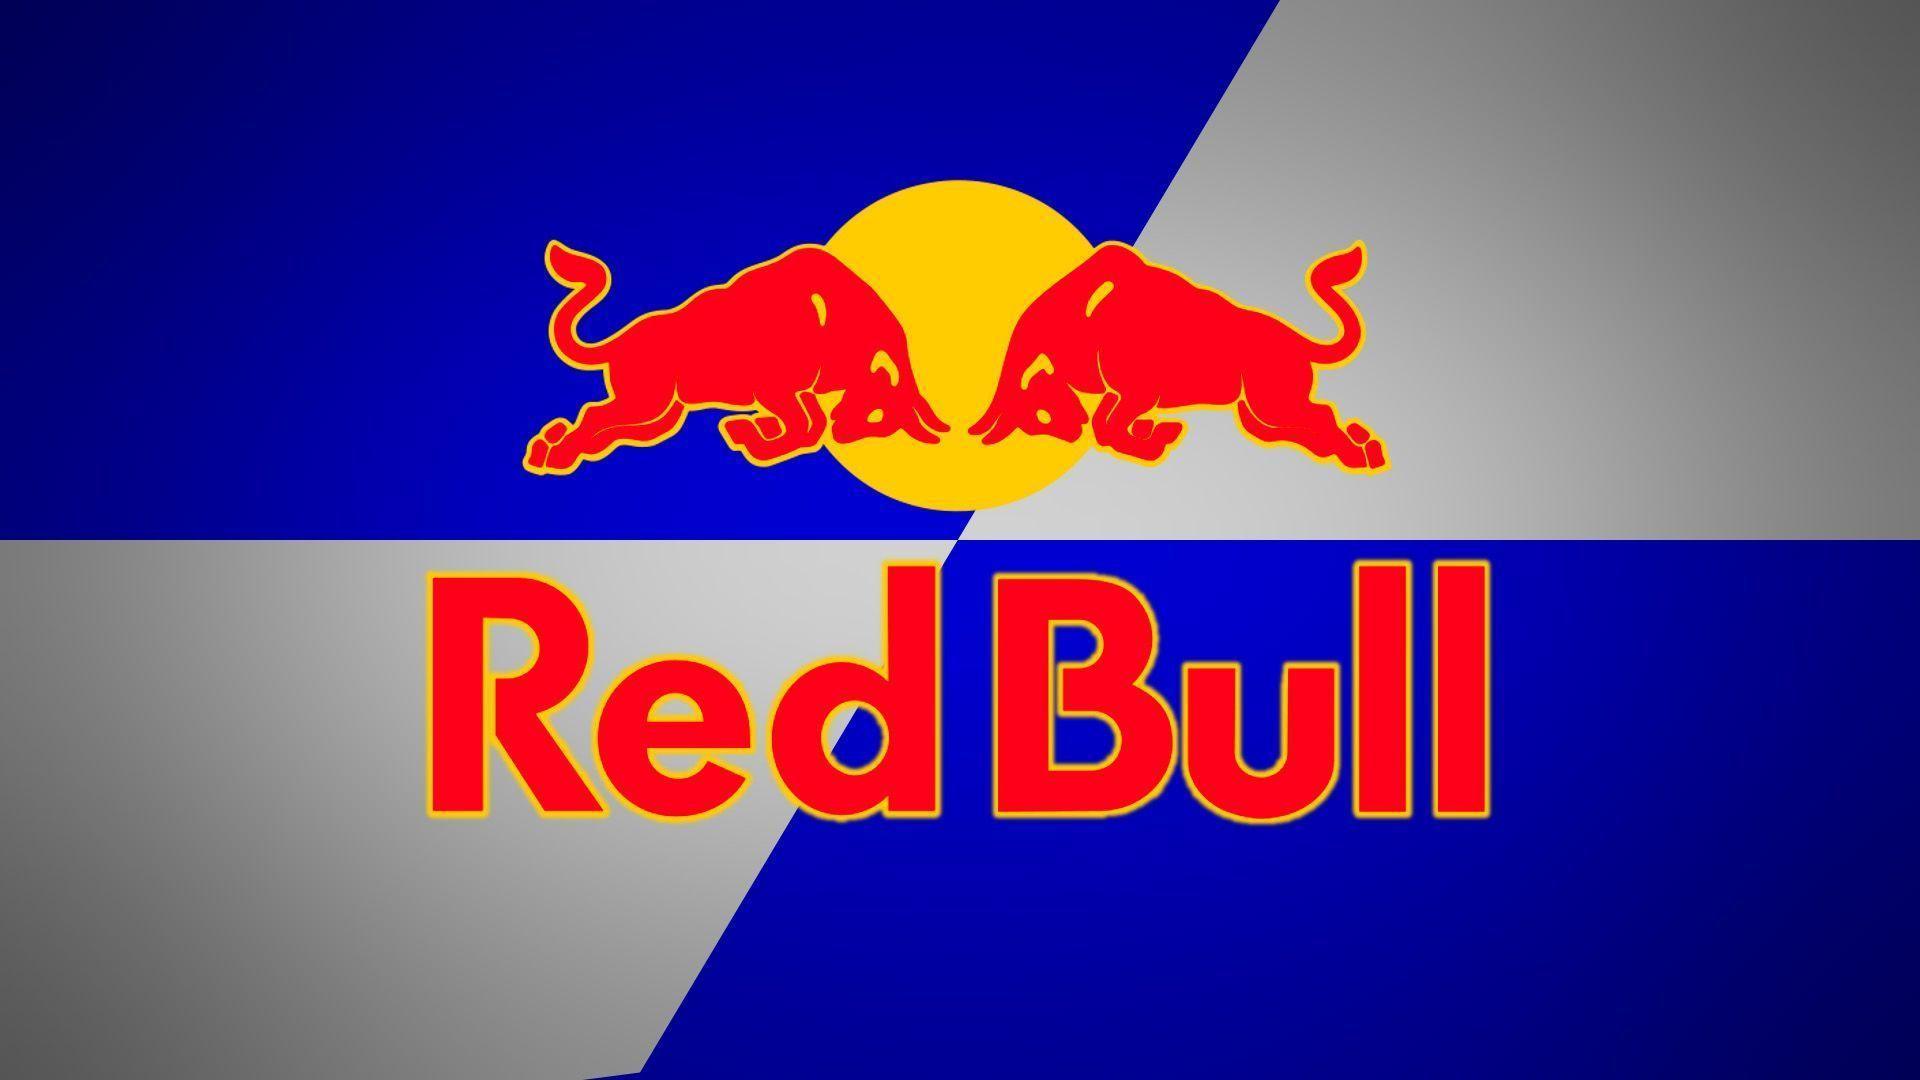 Red Bull Logo Pics